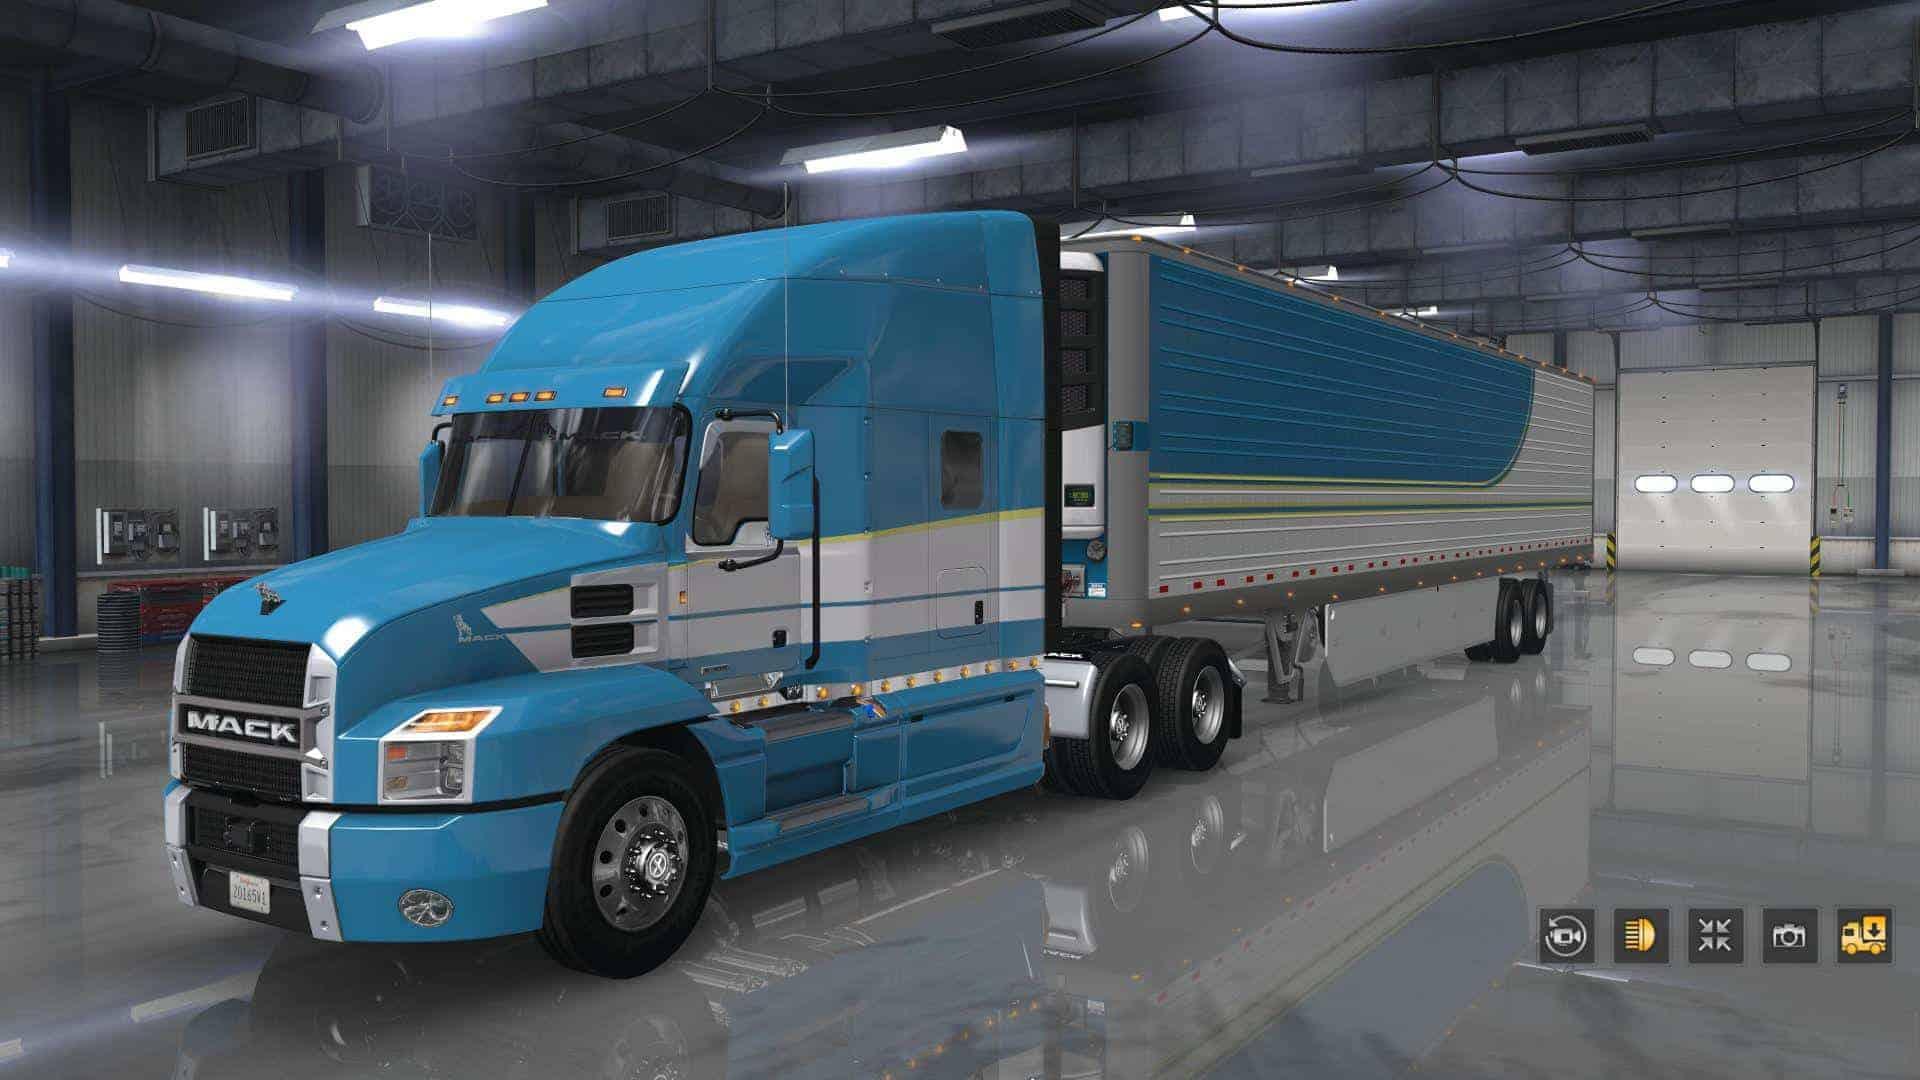 Mack Anthem v1 2 Truck 1 35 x - ATS Mod | American Truck Simulator Mod